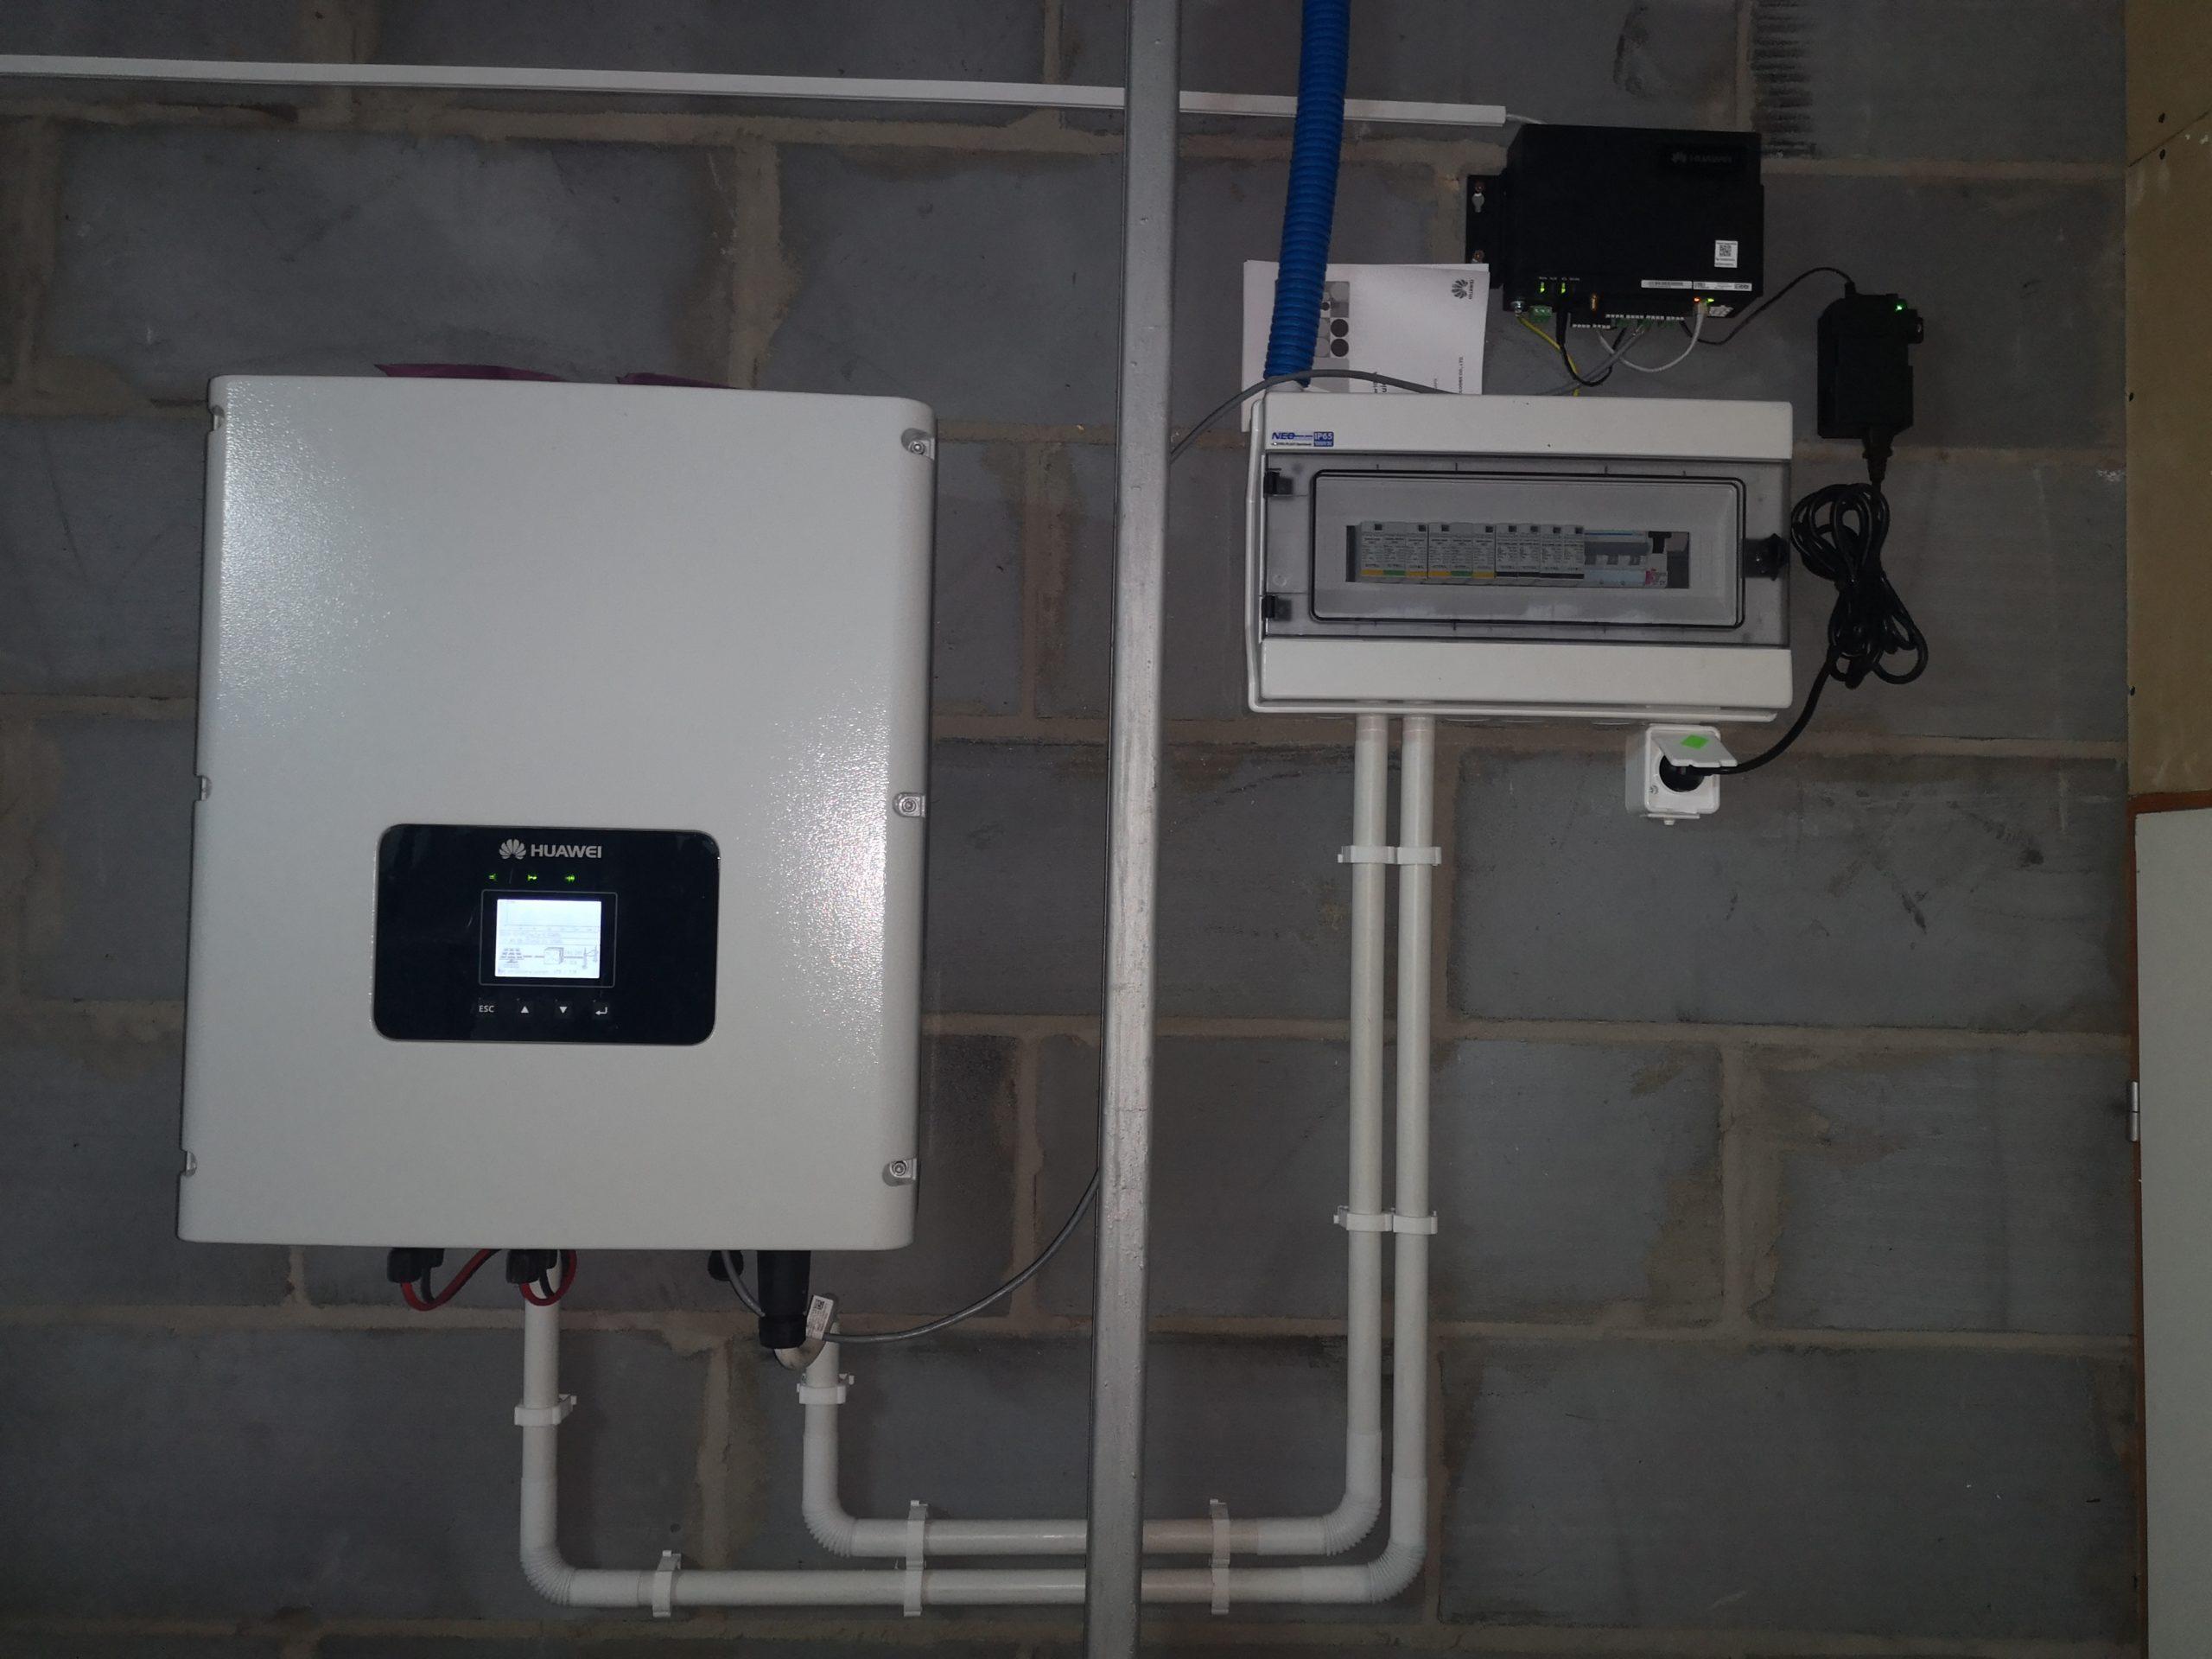 inwerter Huawei +  SmartLogger 1000! (monitoring instalacji) - Poniatowa